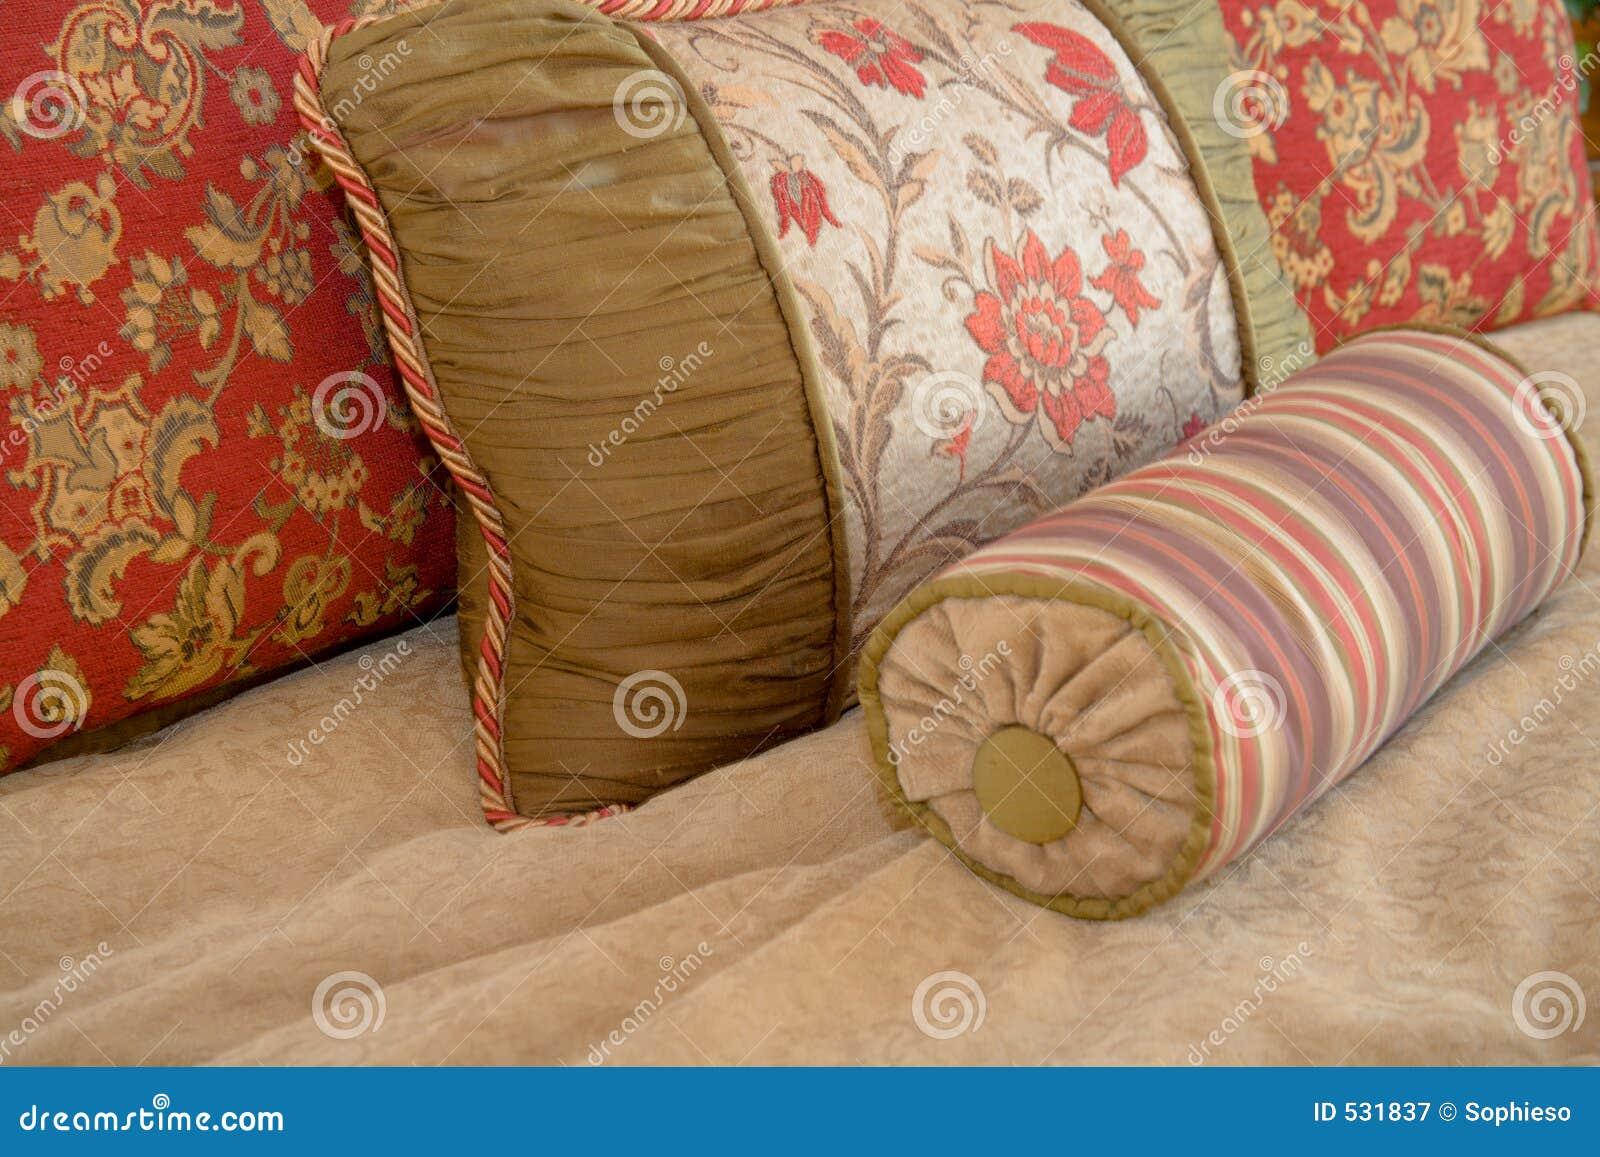 Pillow Arrangement Royalty Free Stock Photography - Image: 531837